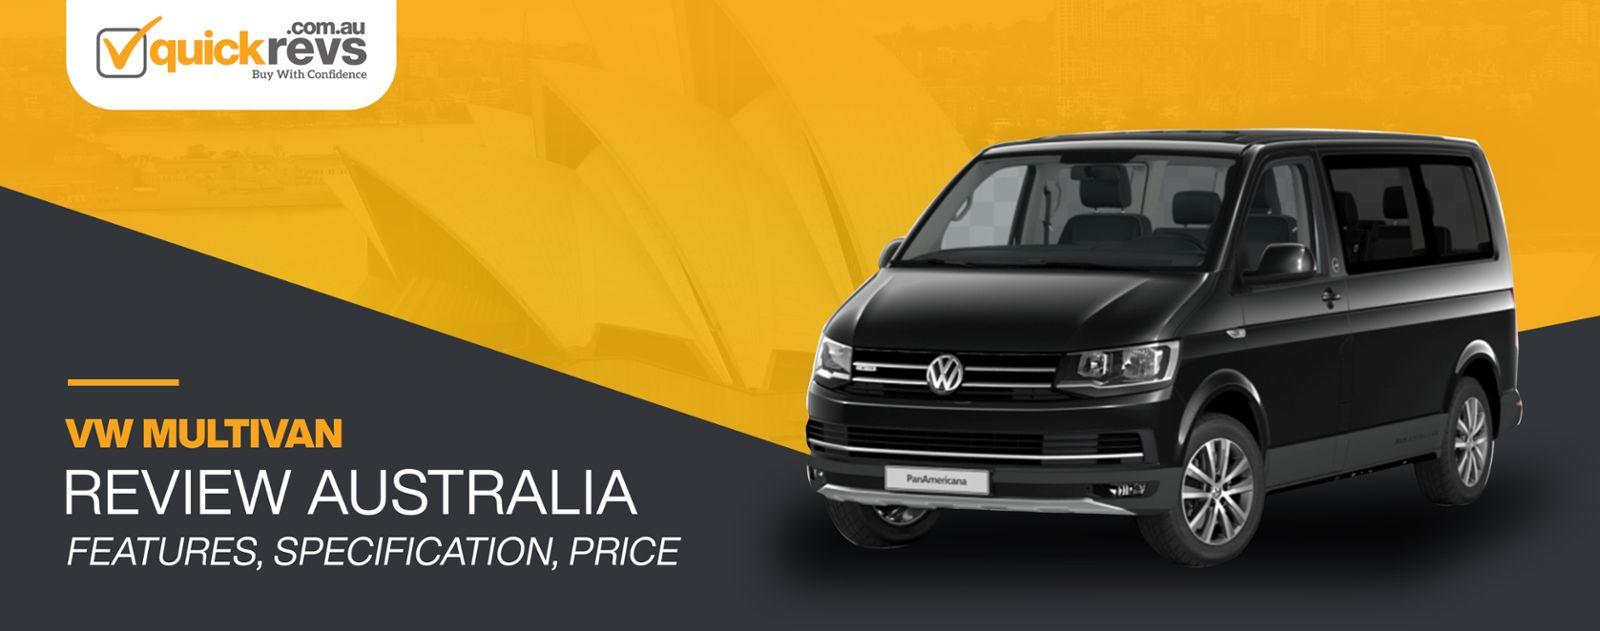 VW Multivan Review Australia